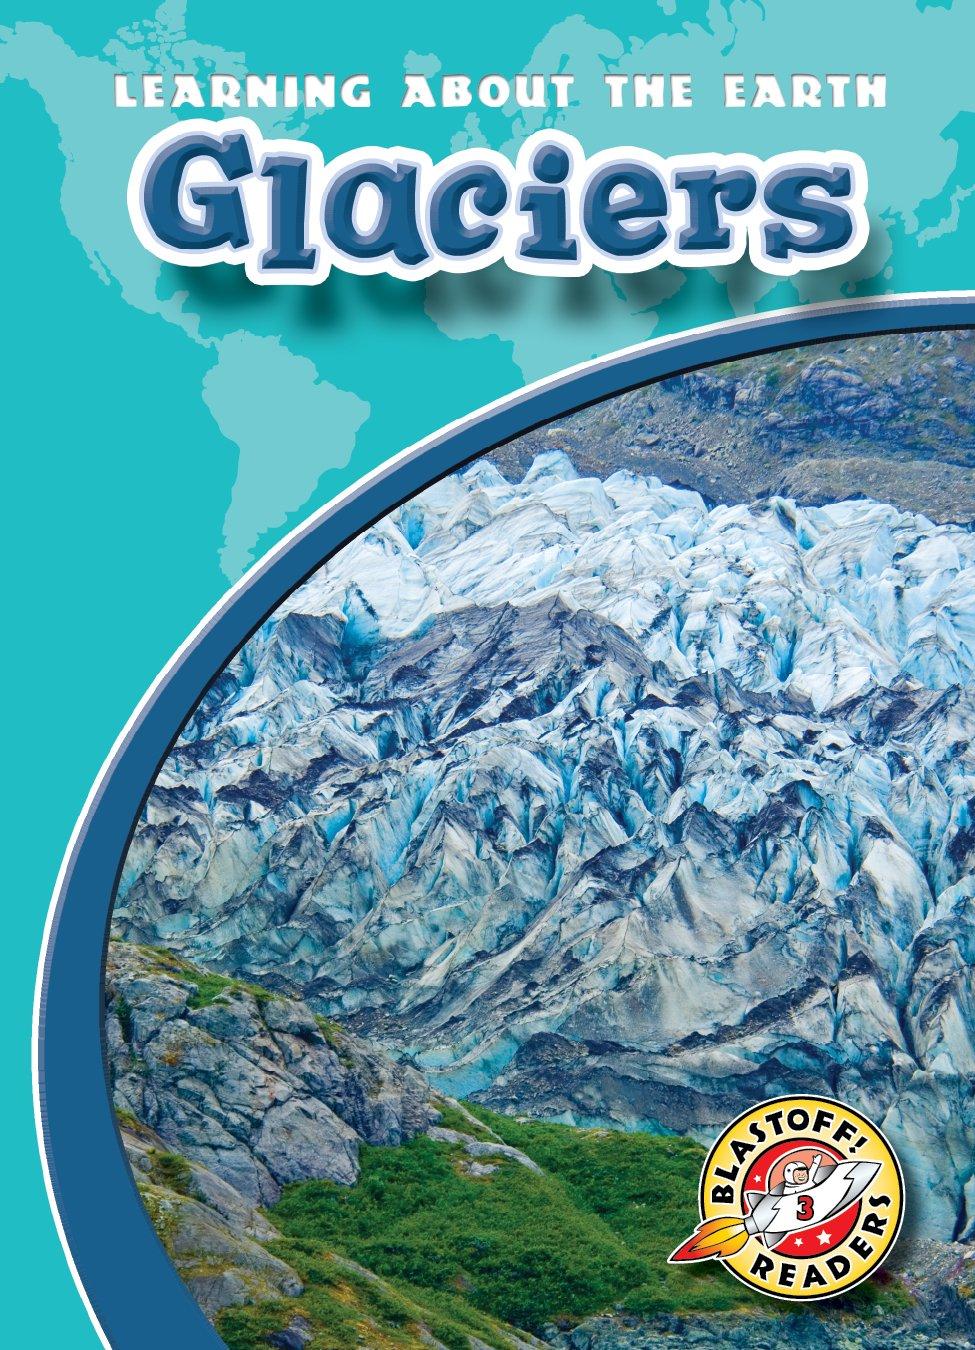 Download Glaciers (Blastoff! Readers: Learning About the Earth) (Learning About the Earth: Blastoff Readers, Level 3) pdf epub